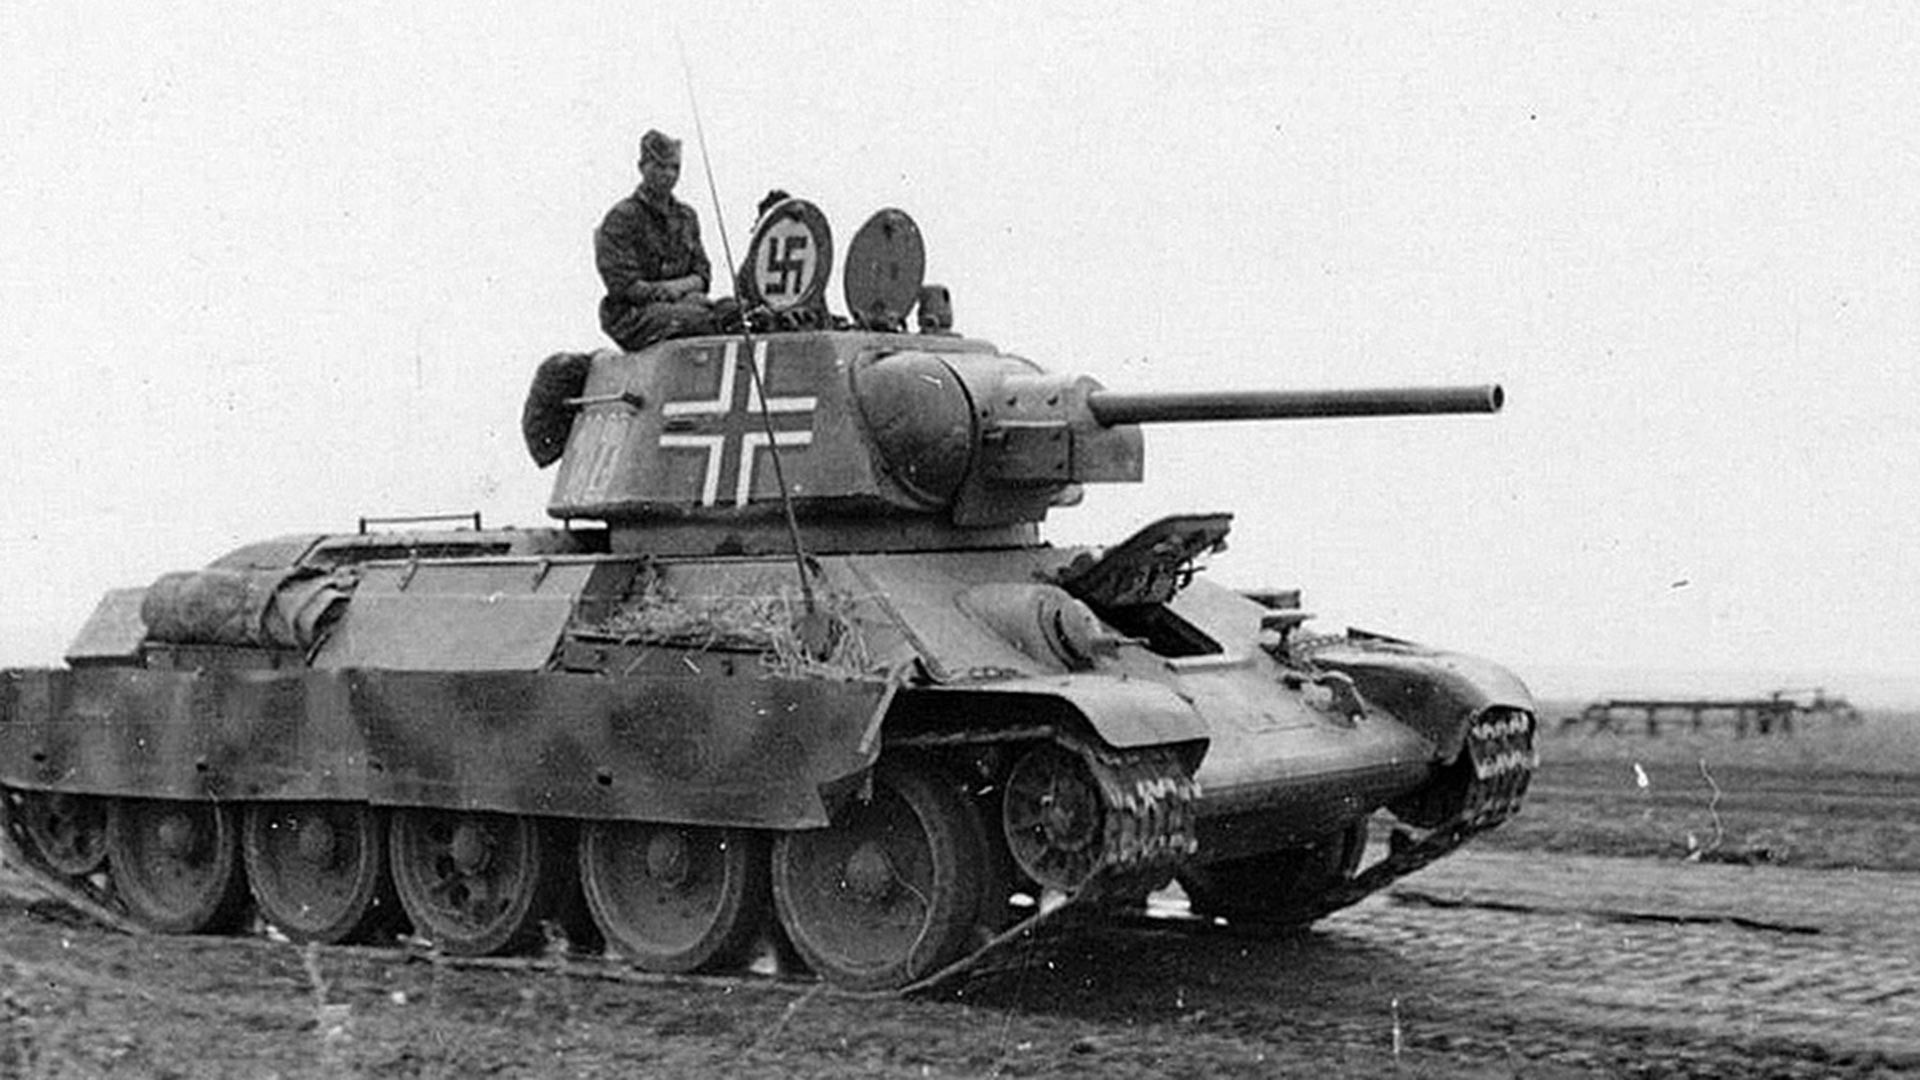 Pz.Kpfw. T-34-747(r) – немачки назив совјетског трофејног тенка Т-34 .